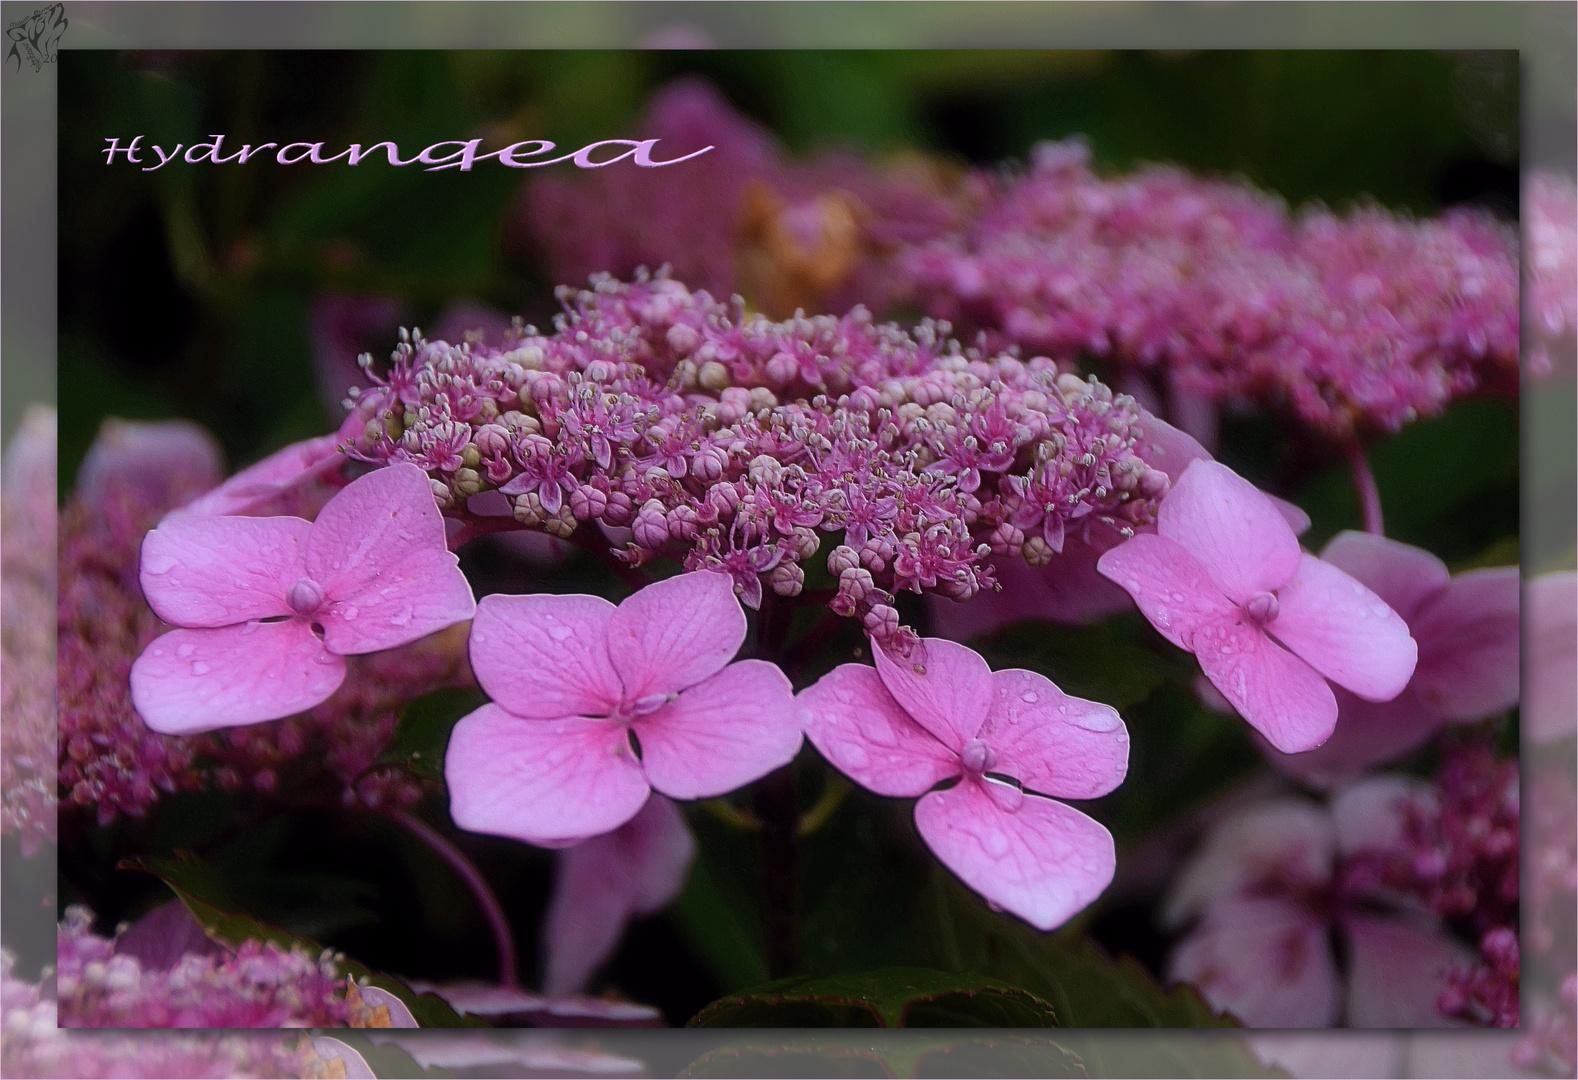 Hydrangea ..